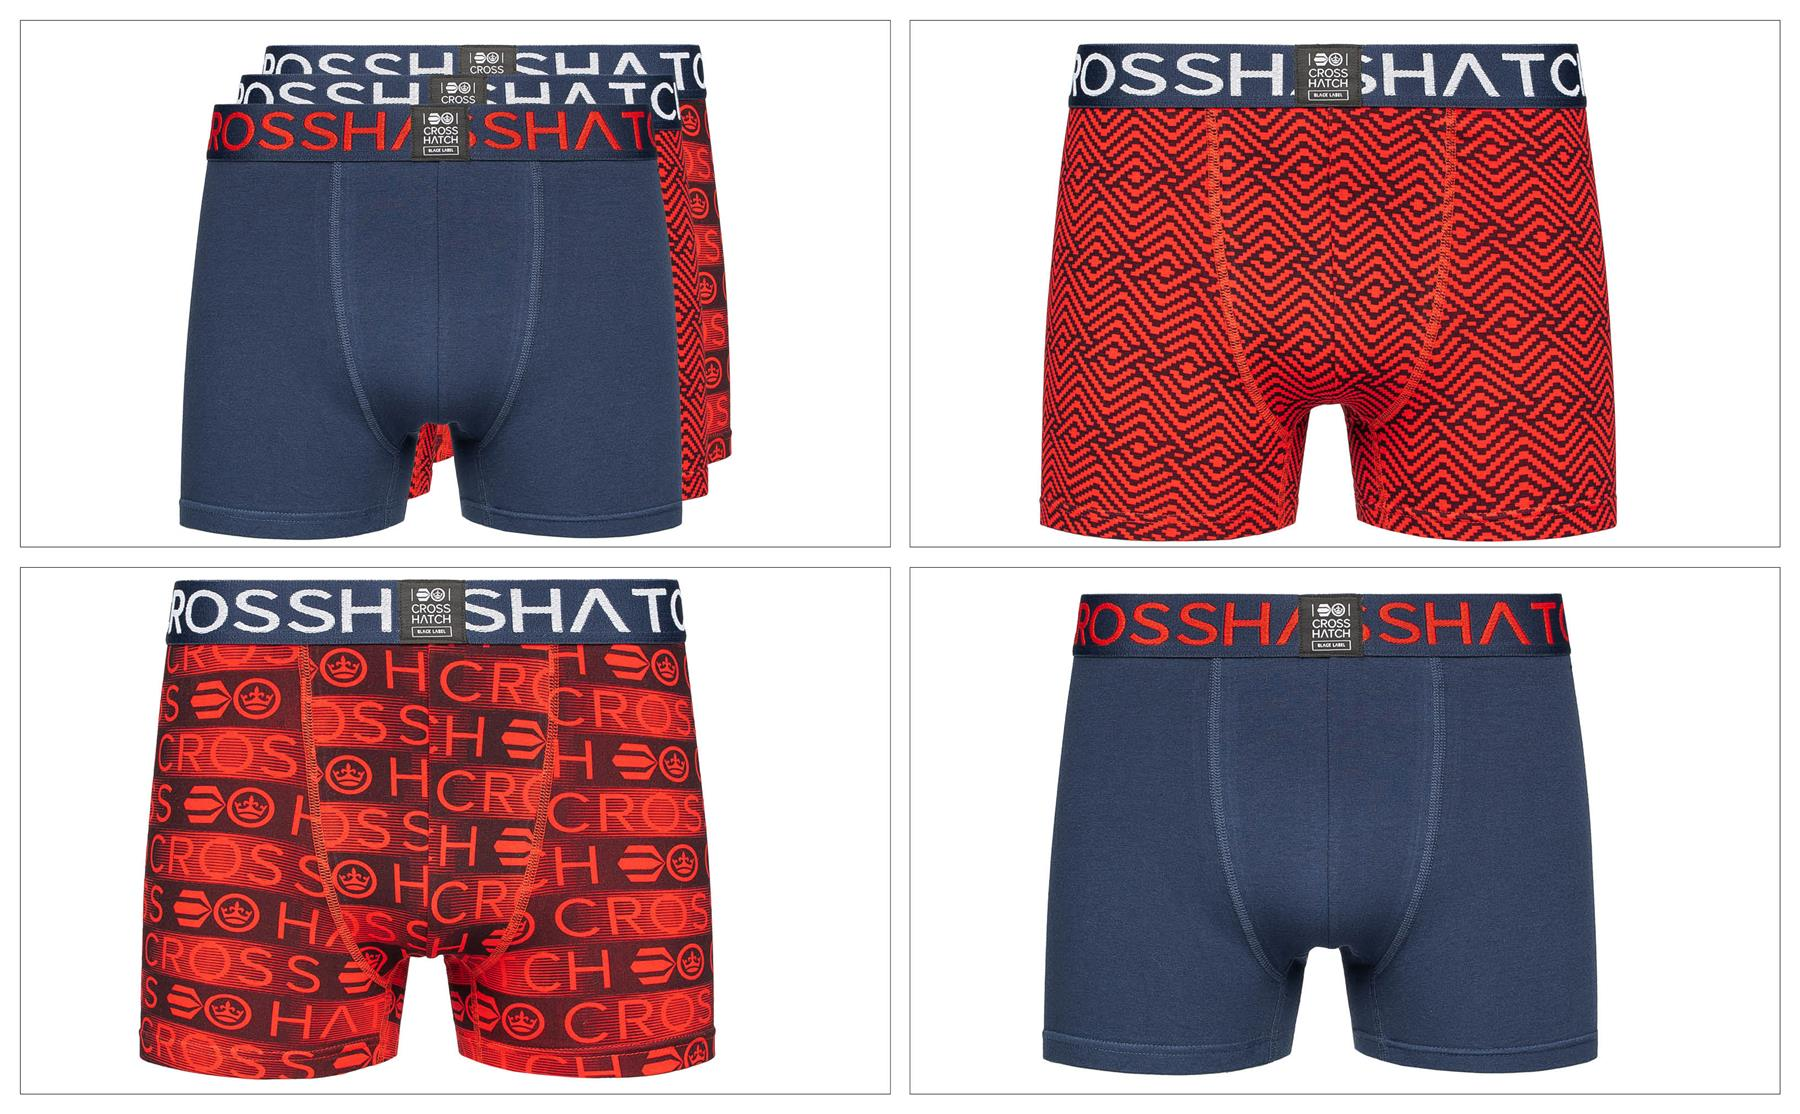 thumbnail 49 - Mens Crosshatch Boxers 3 Pack Shorts Underwear Trunks Underpants Multipack Sets